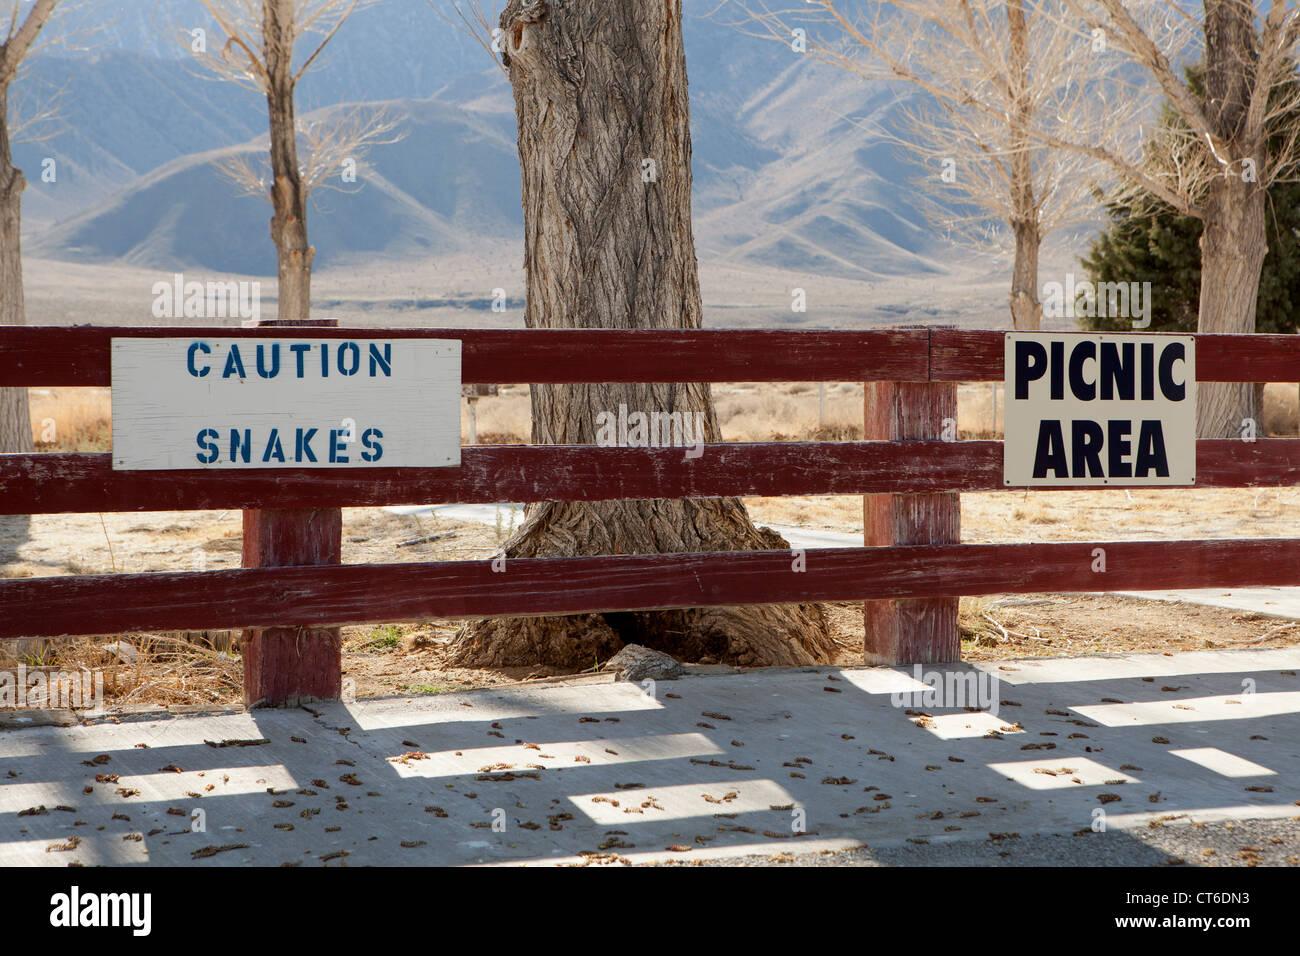 Amusing signs in California - Stock Image